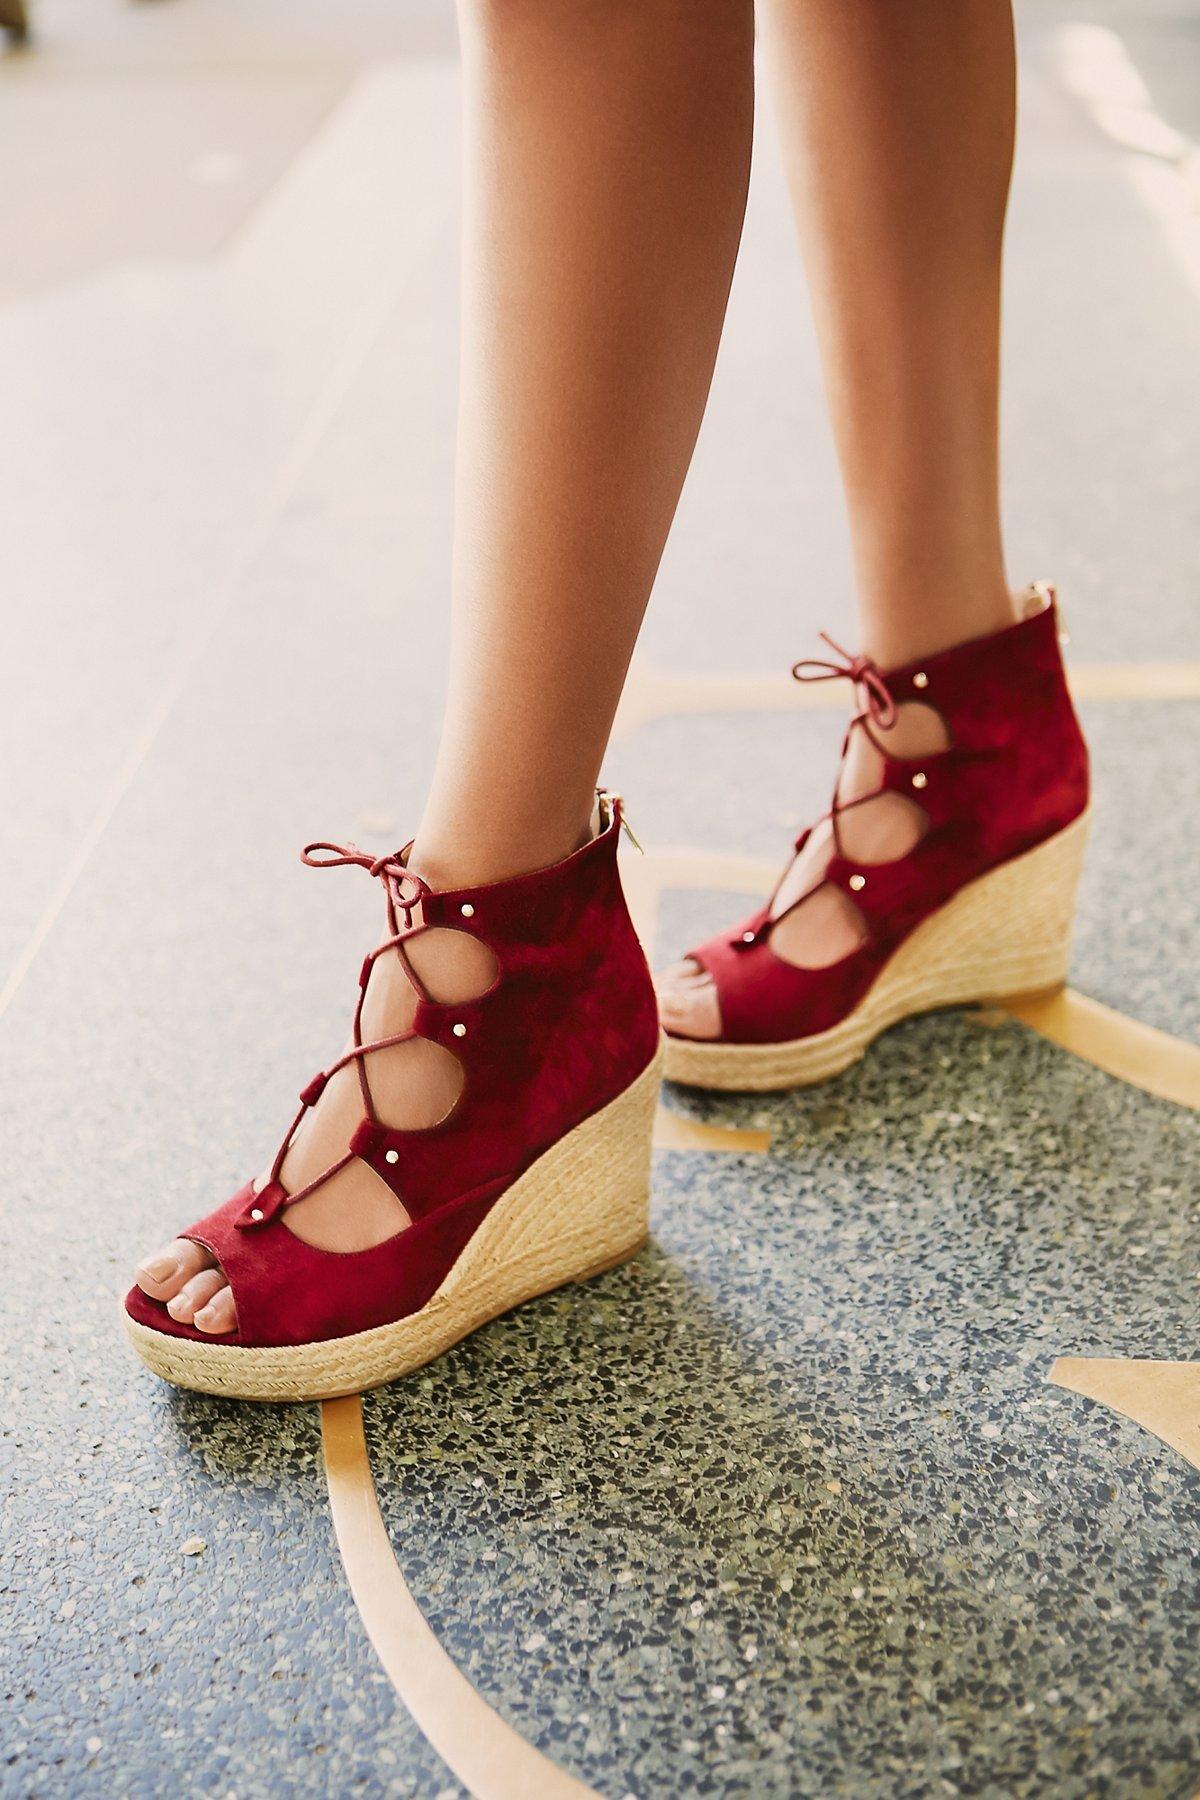 Prima系带坡跟鞋